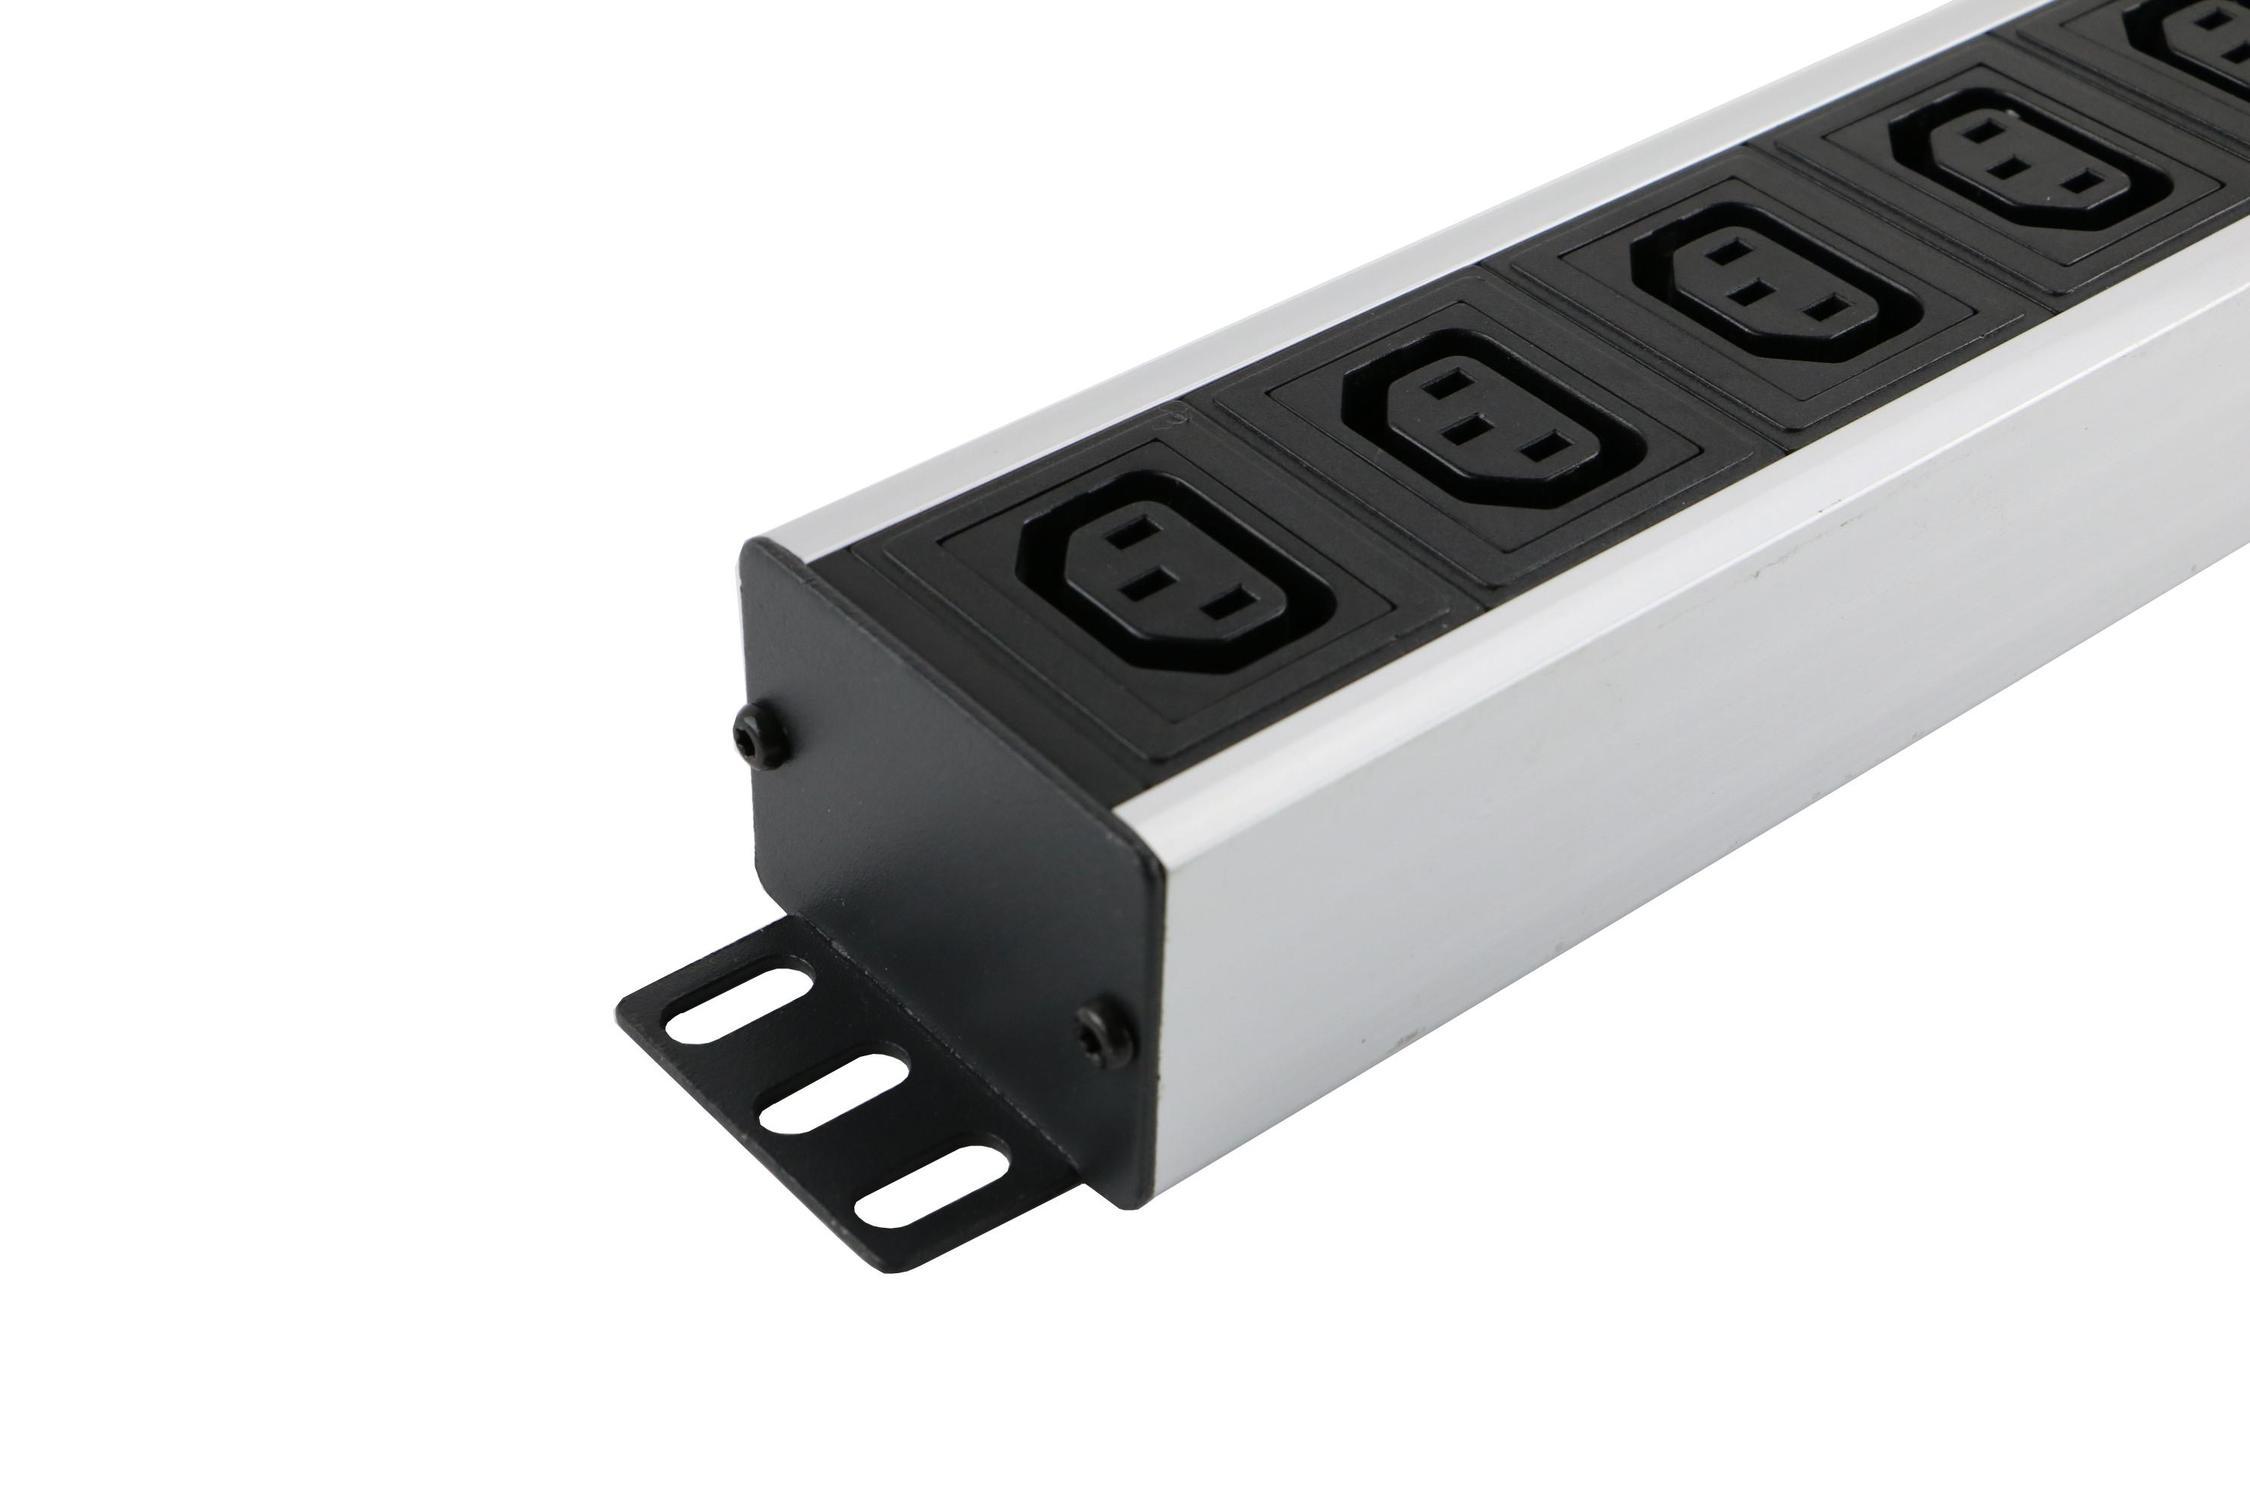 555-241 Excel PDU 8-Wege C13-Steckdosen - C14-Stecker - Vertikal ...